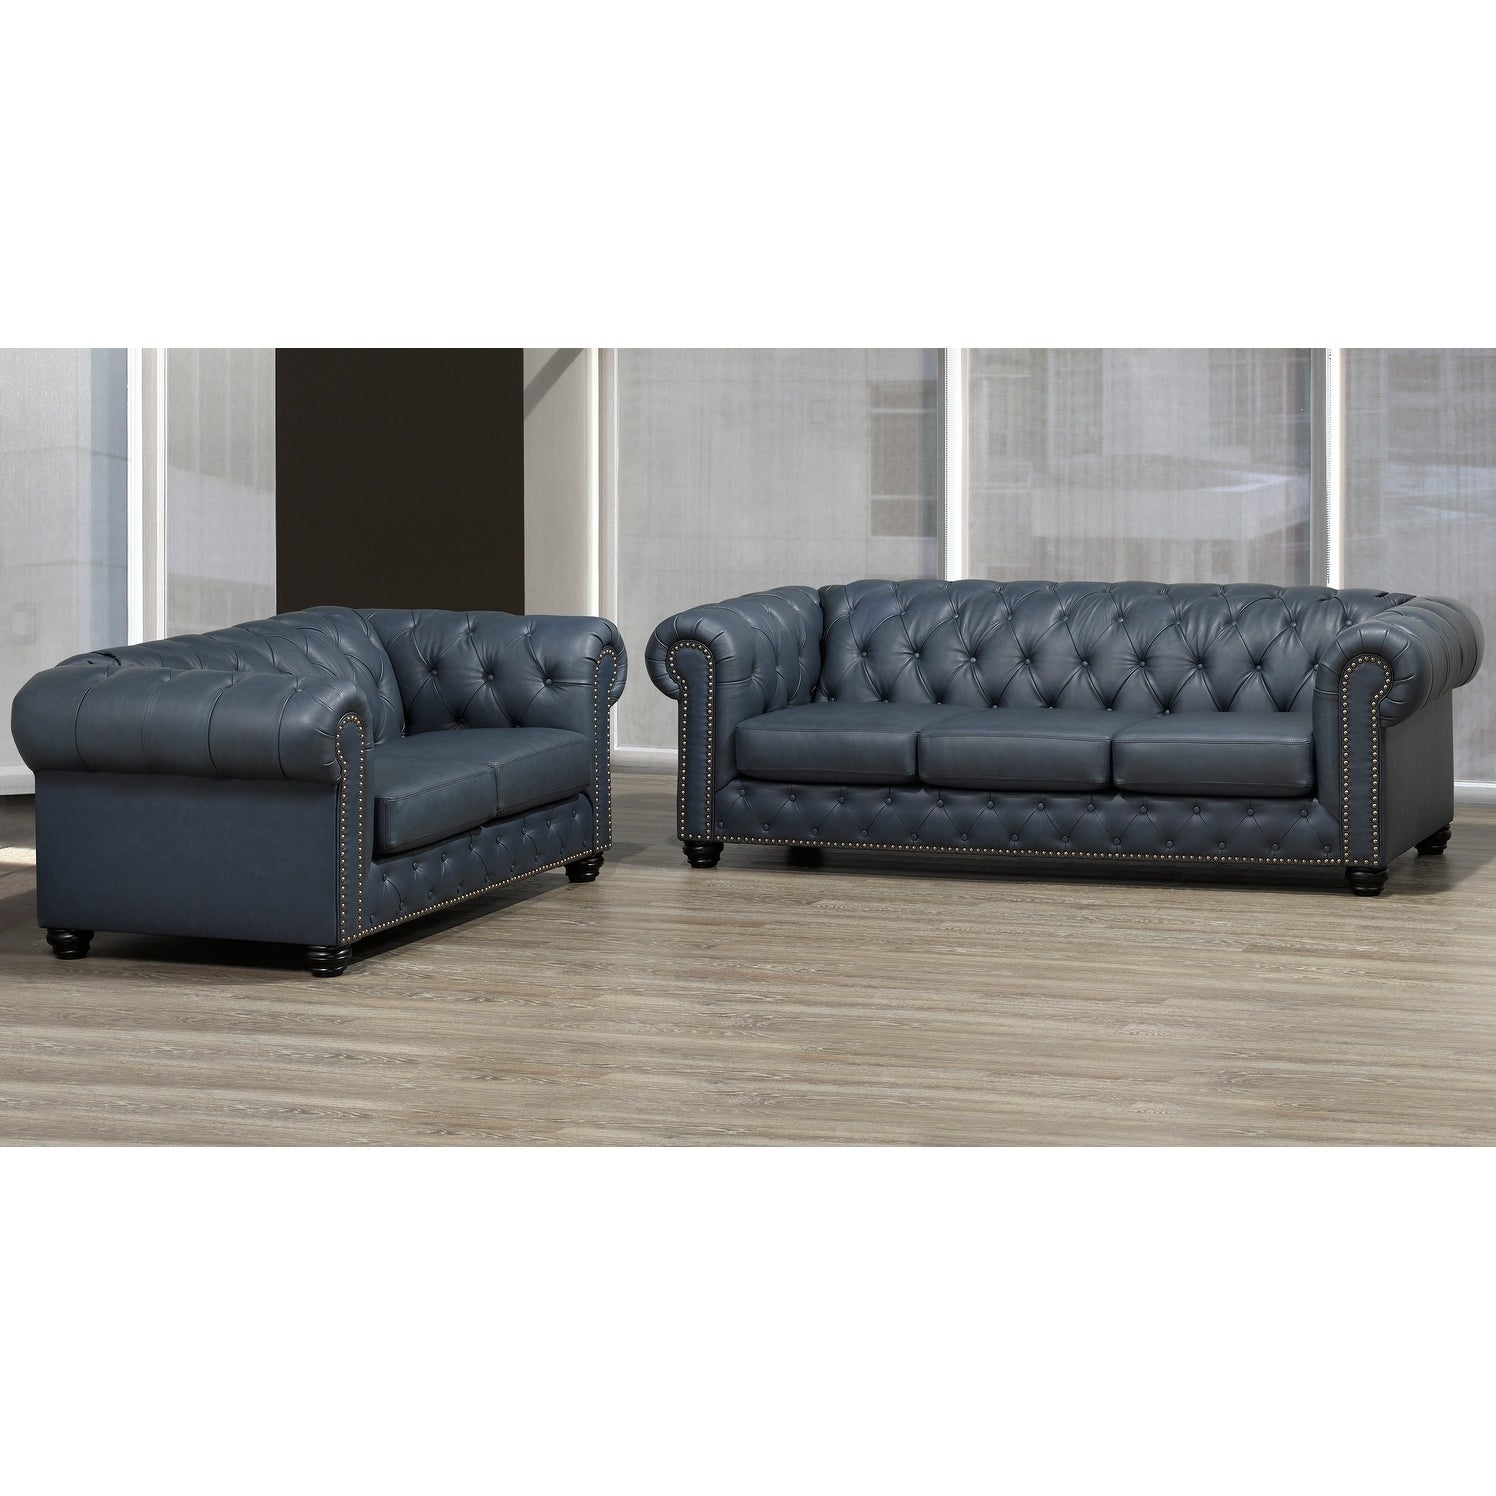 Wigan Top Grain Leather Sofa and Loveseat Set